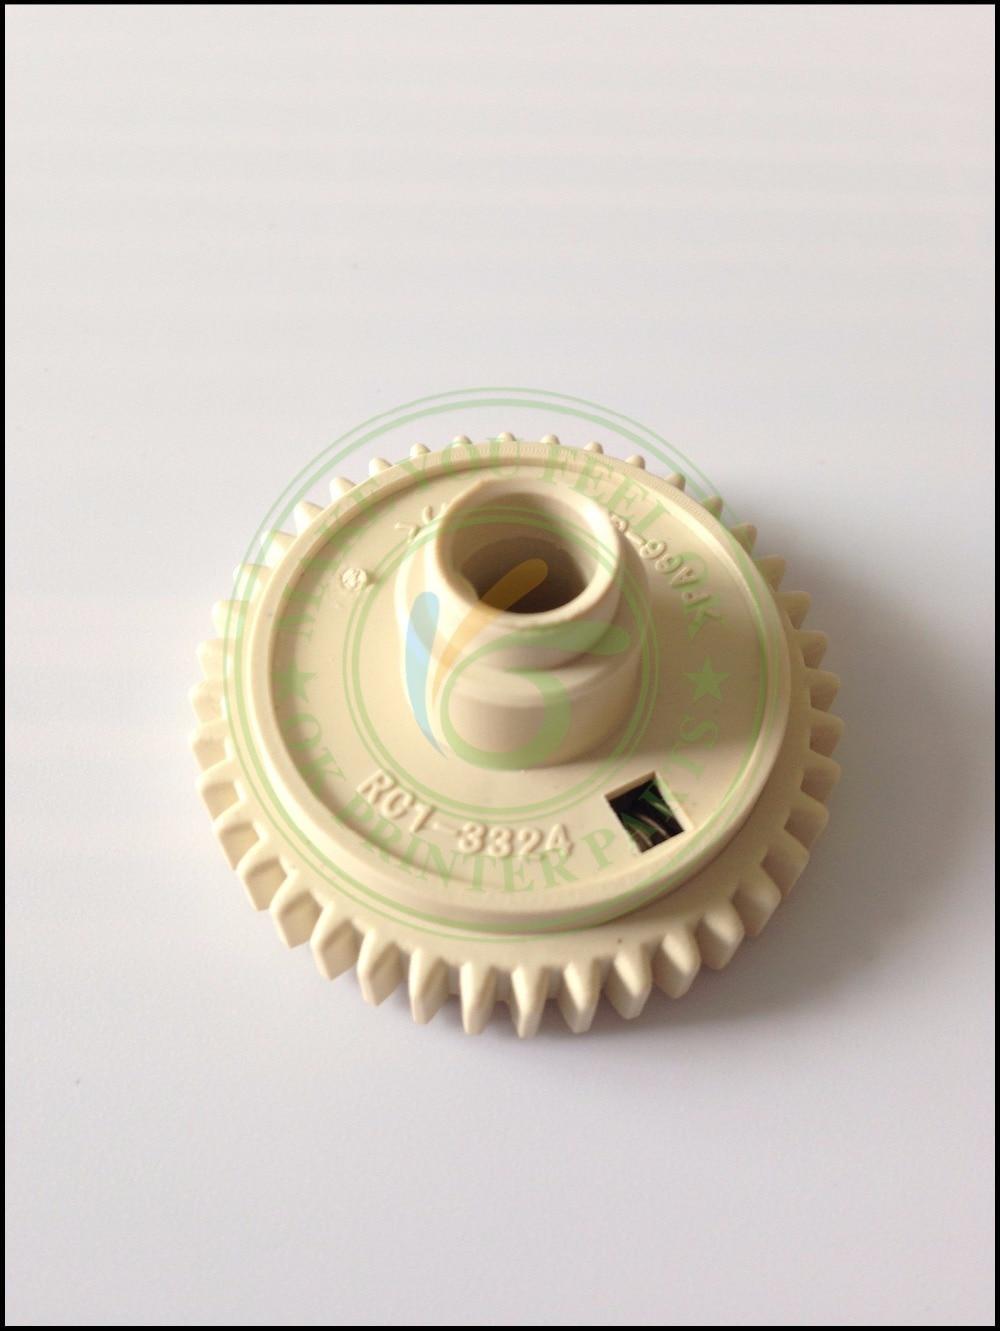 RC1-3324 RC1-3325 RC1-3324-000 RC1-3325-000 Upper Fuser Roller Gear Drive Gear Assembly 40T for HP 4200 4240 4250 4300 4350 4345 1 x new fuser service kit for hp laserjet 4250 4300 4350 4345 fuser film sleeve fuser pressure roller bushing